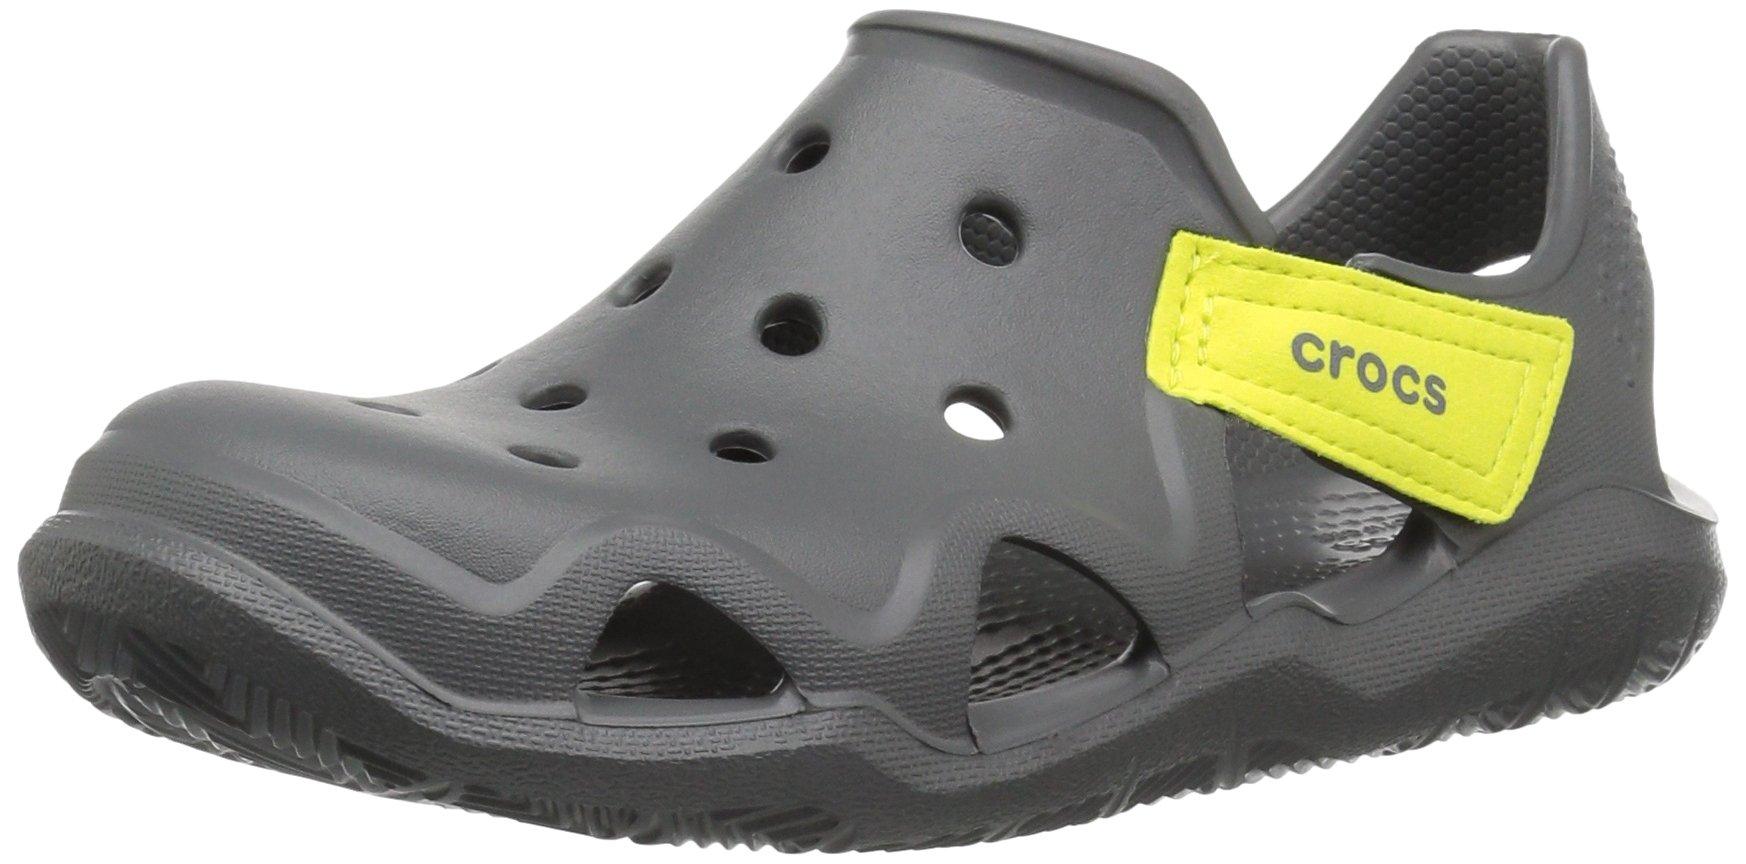 Crocs Unisex-Kids Swiftwater Wave Flat Sandal, Slate Grey/Tennis Ball Green, 13 M US Little Kid